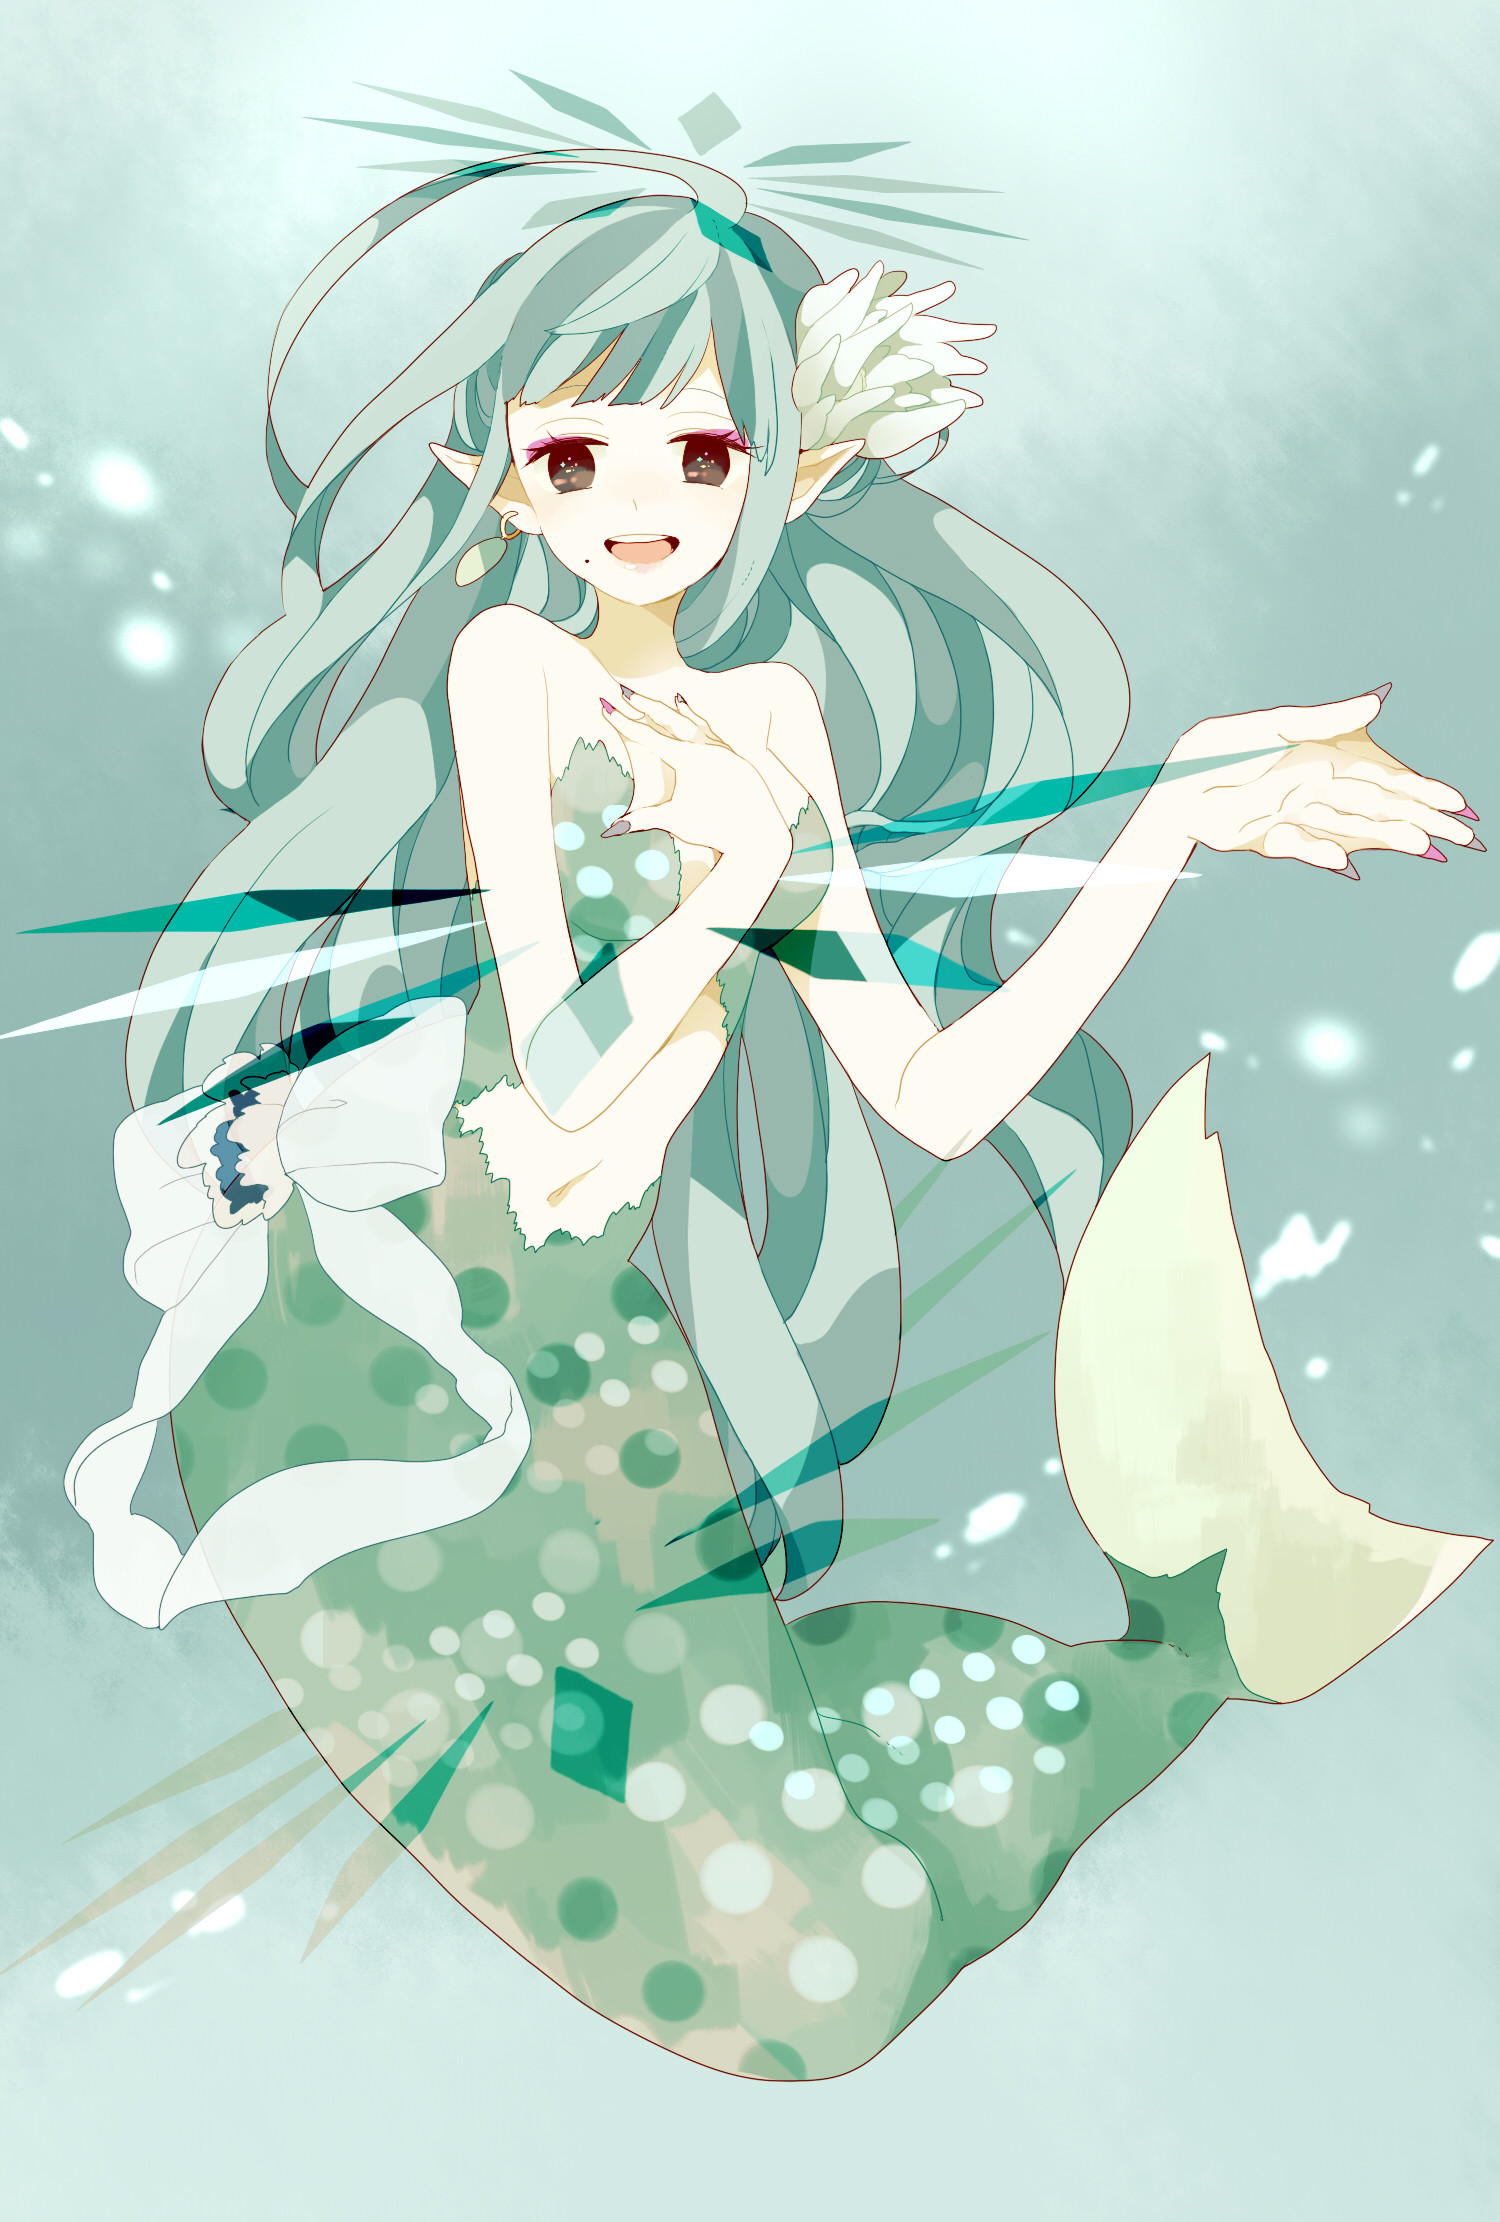 anime-girl-as-a-mermaid-wallpaper